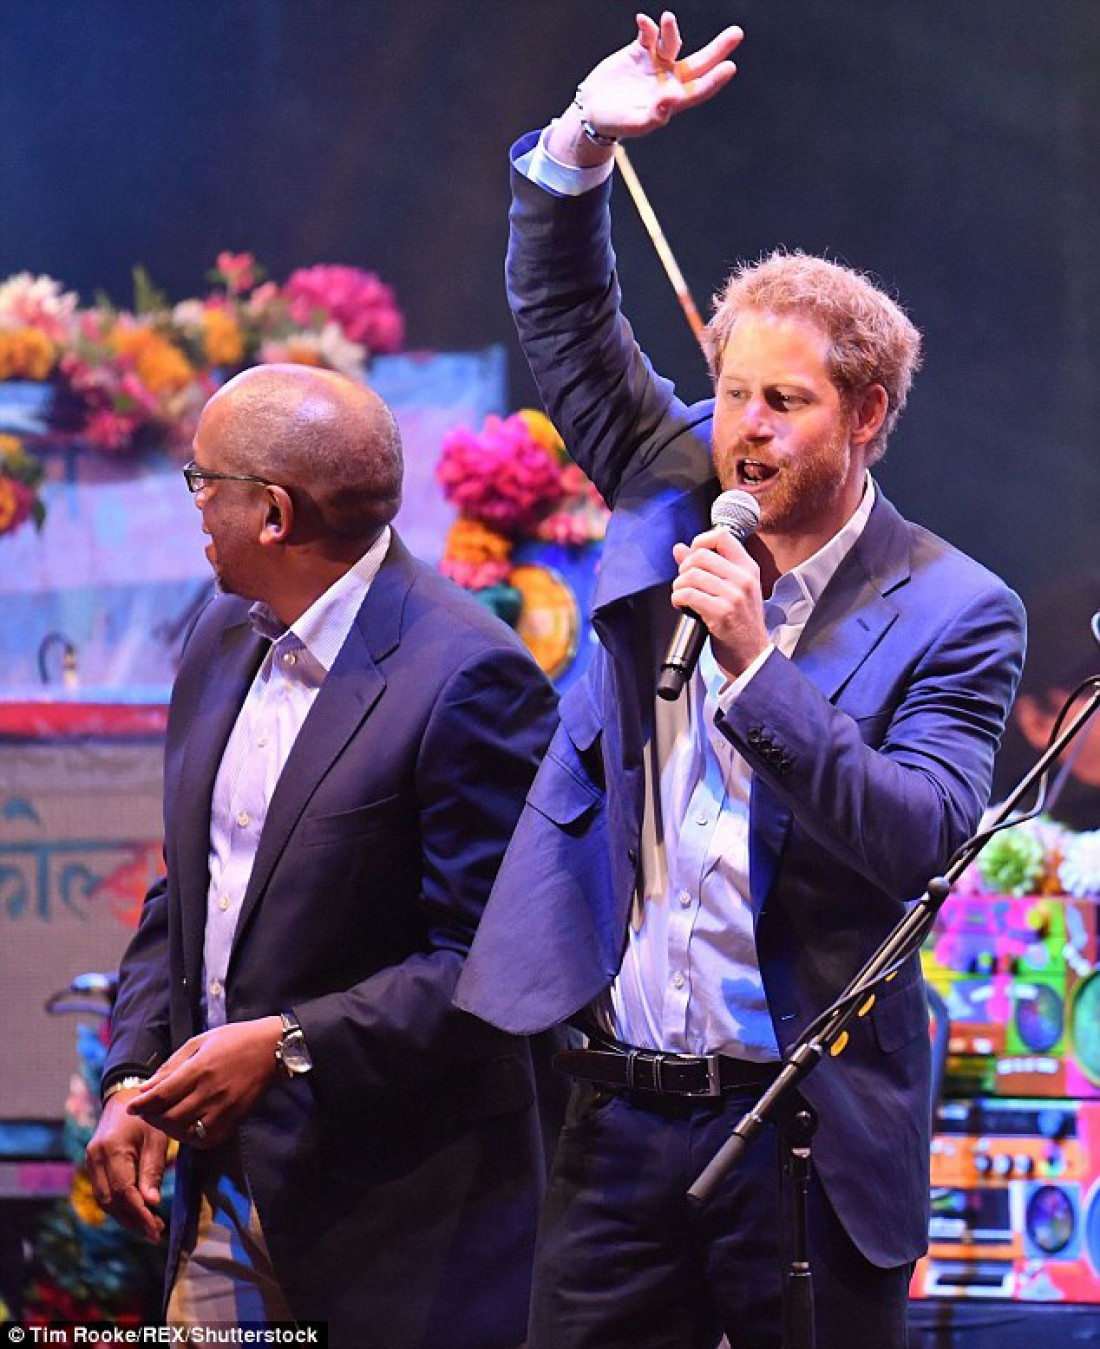 Принц Гарри на концерте Coldplay